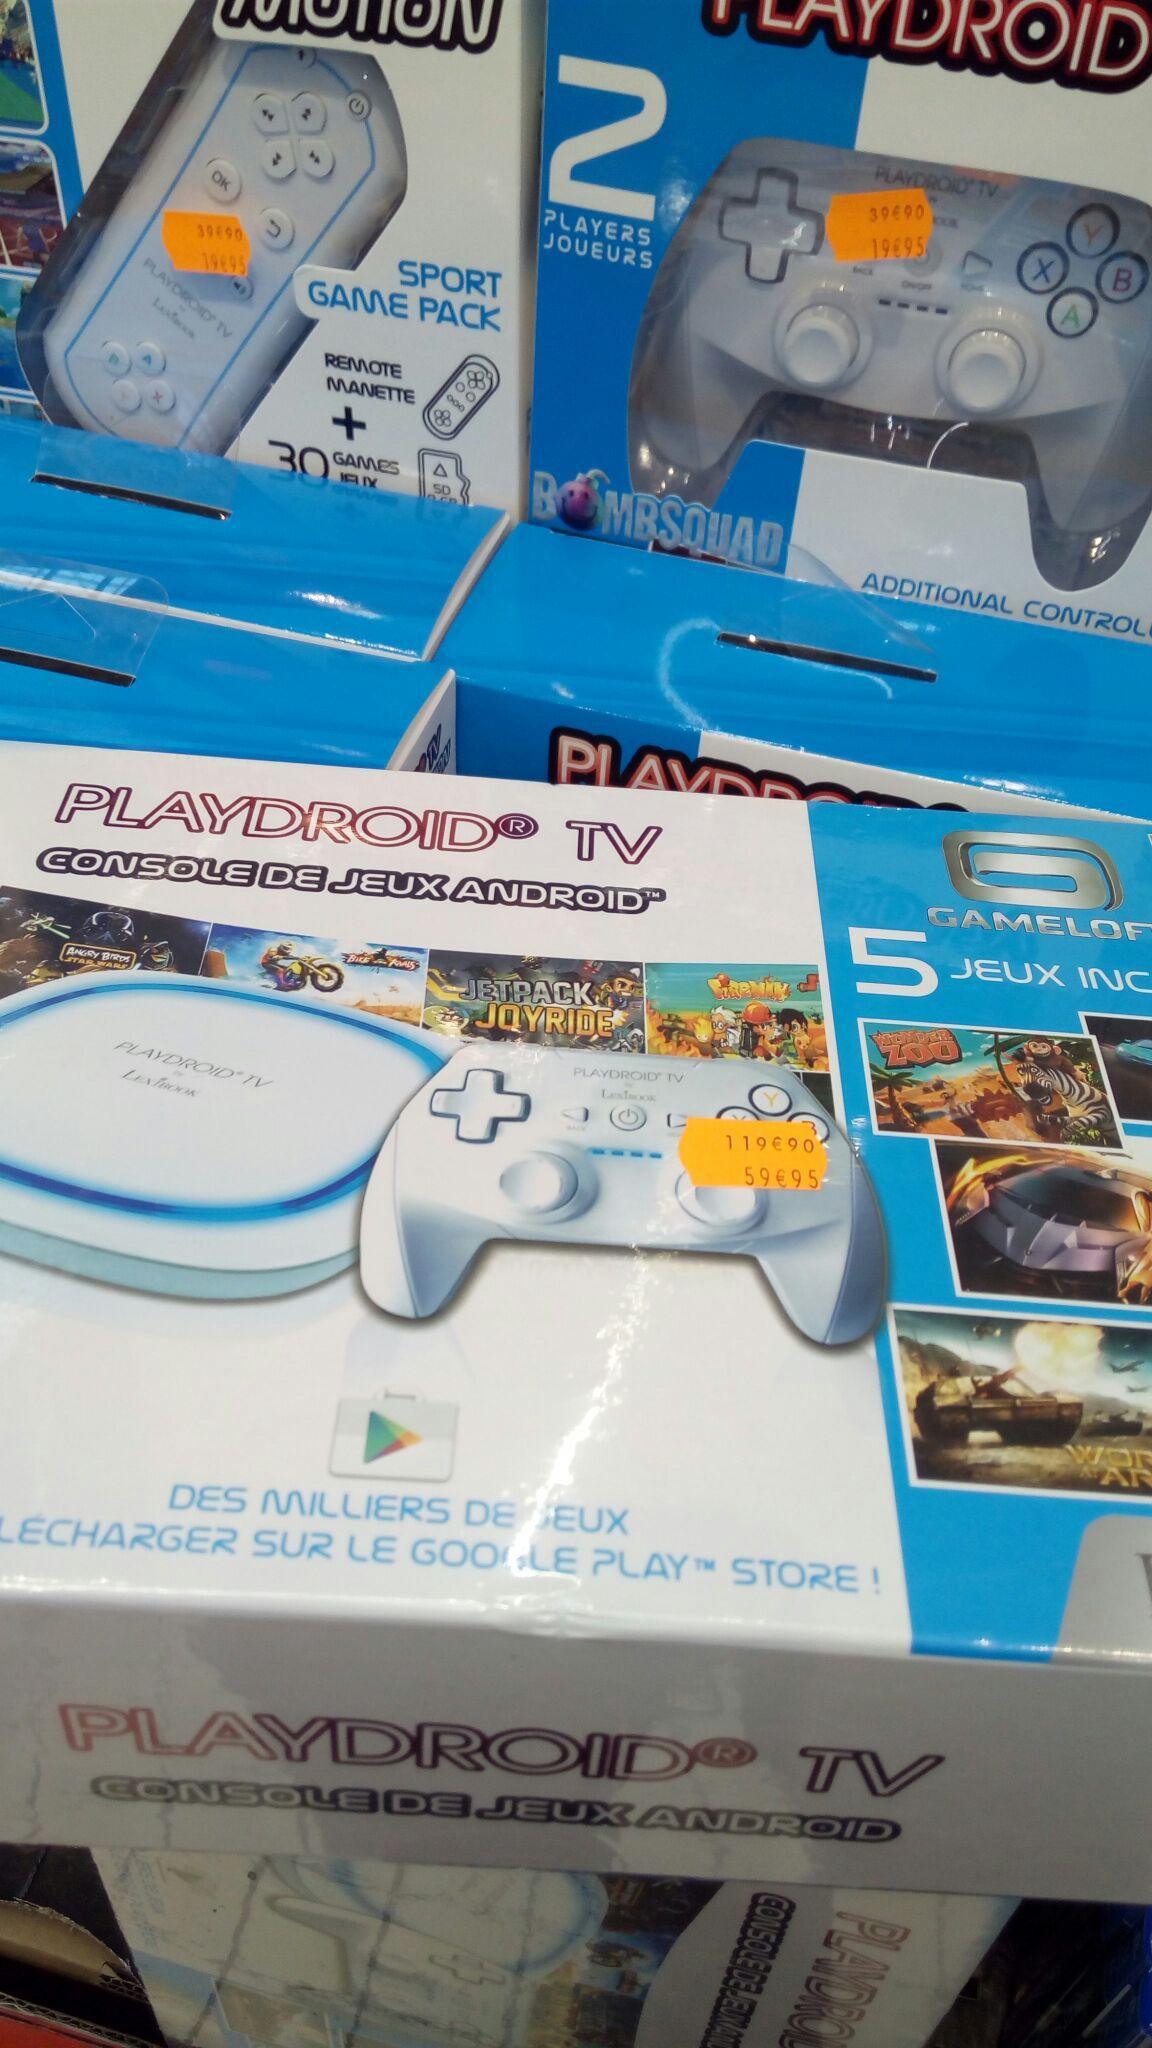 Console Lexibook PlayDroid TV